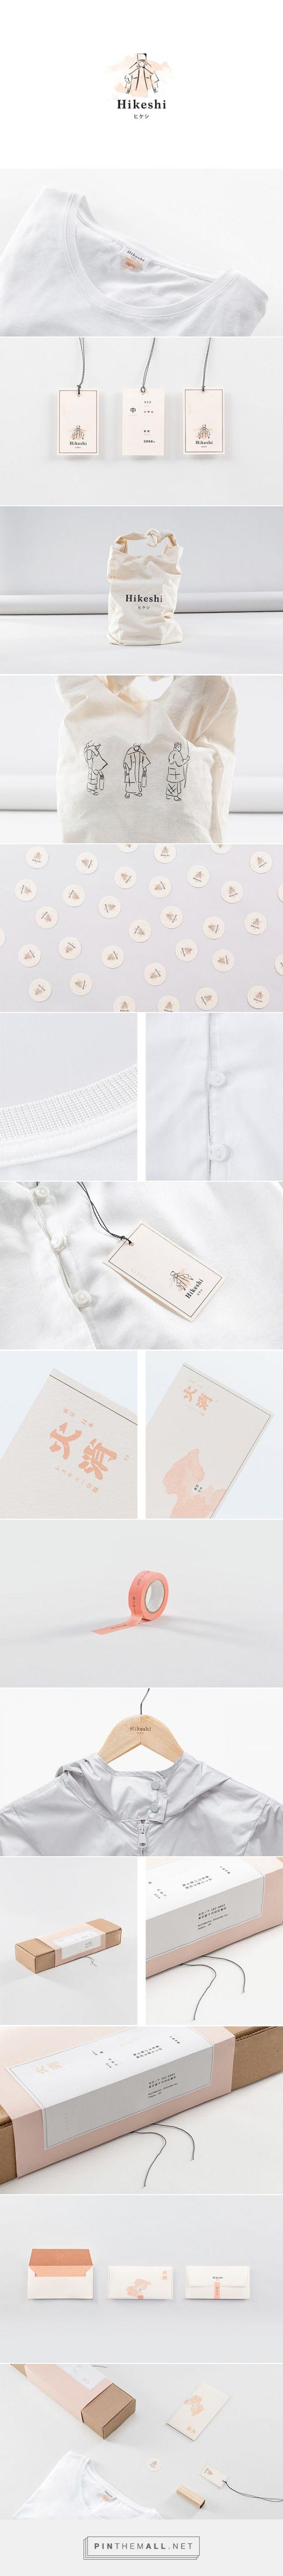 Hikeshi clothing packaging designed by Futura - http://www.packagingoftheworld.com/2015/08/hikeshi.html